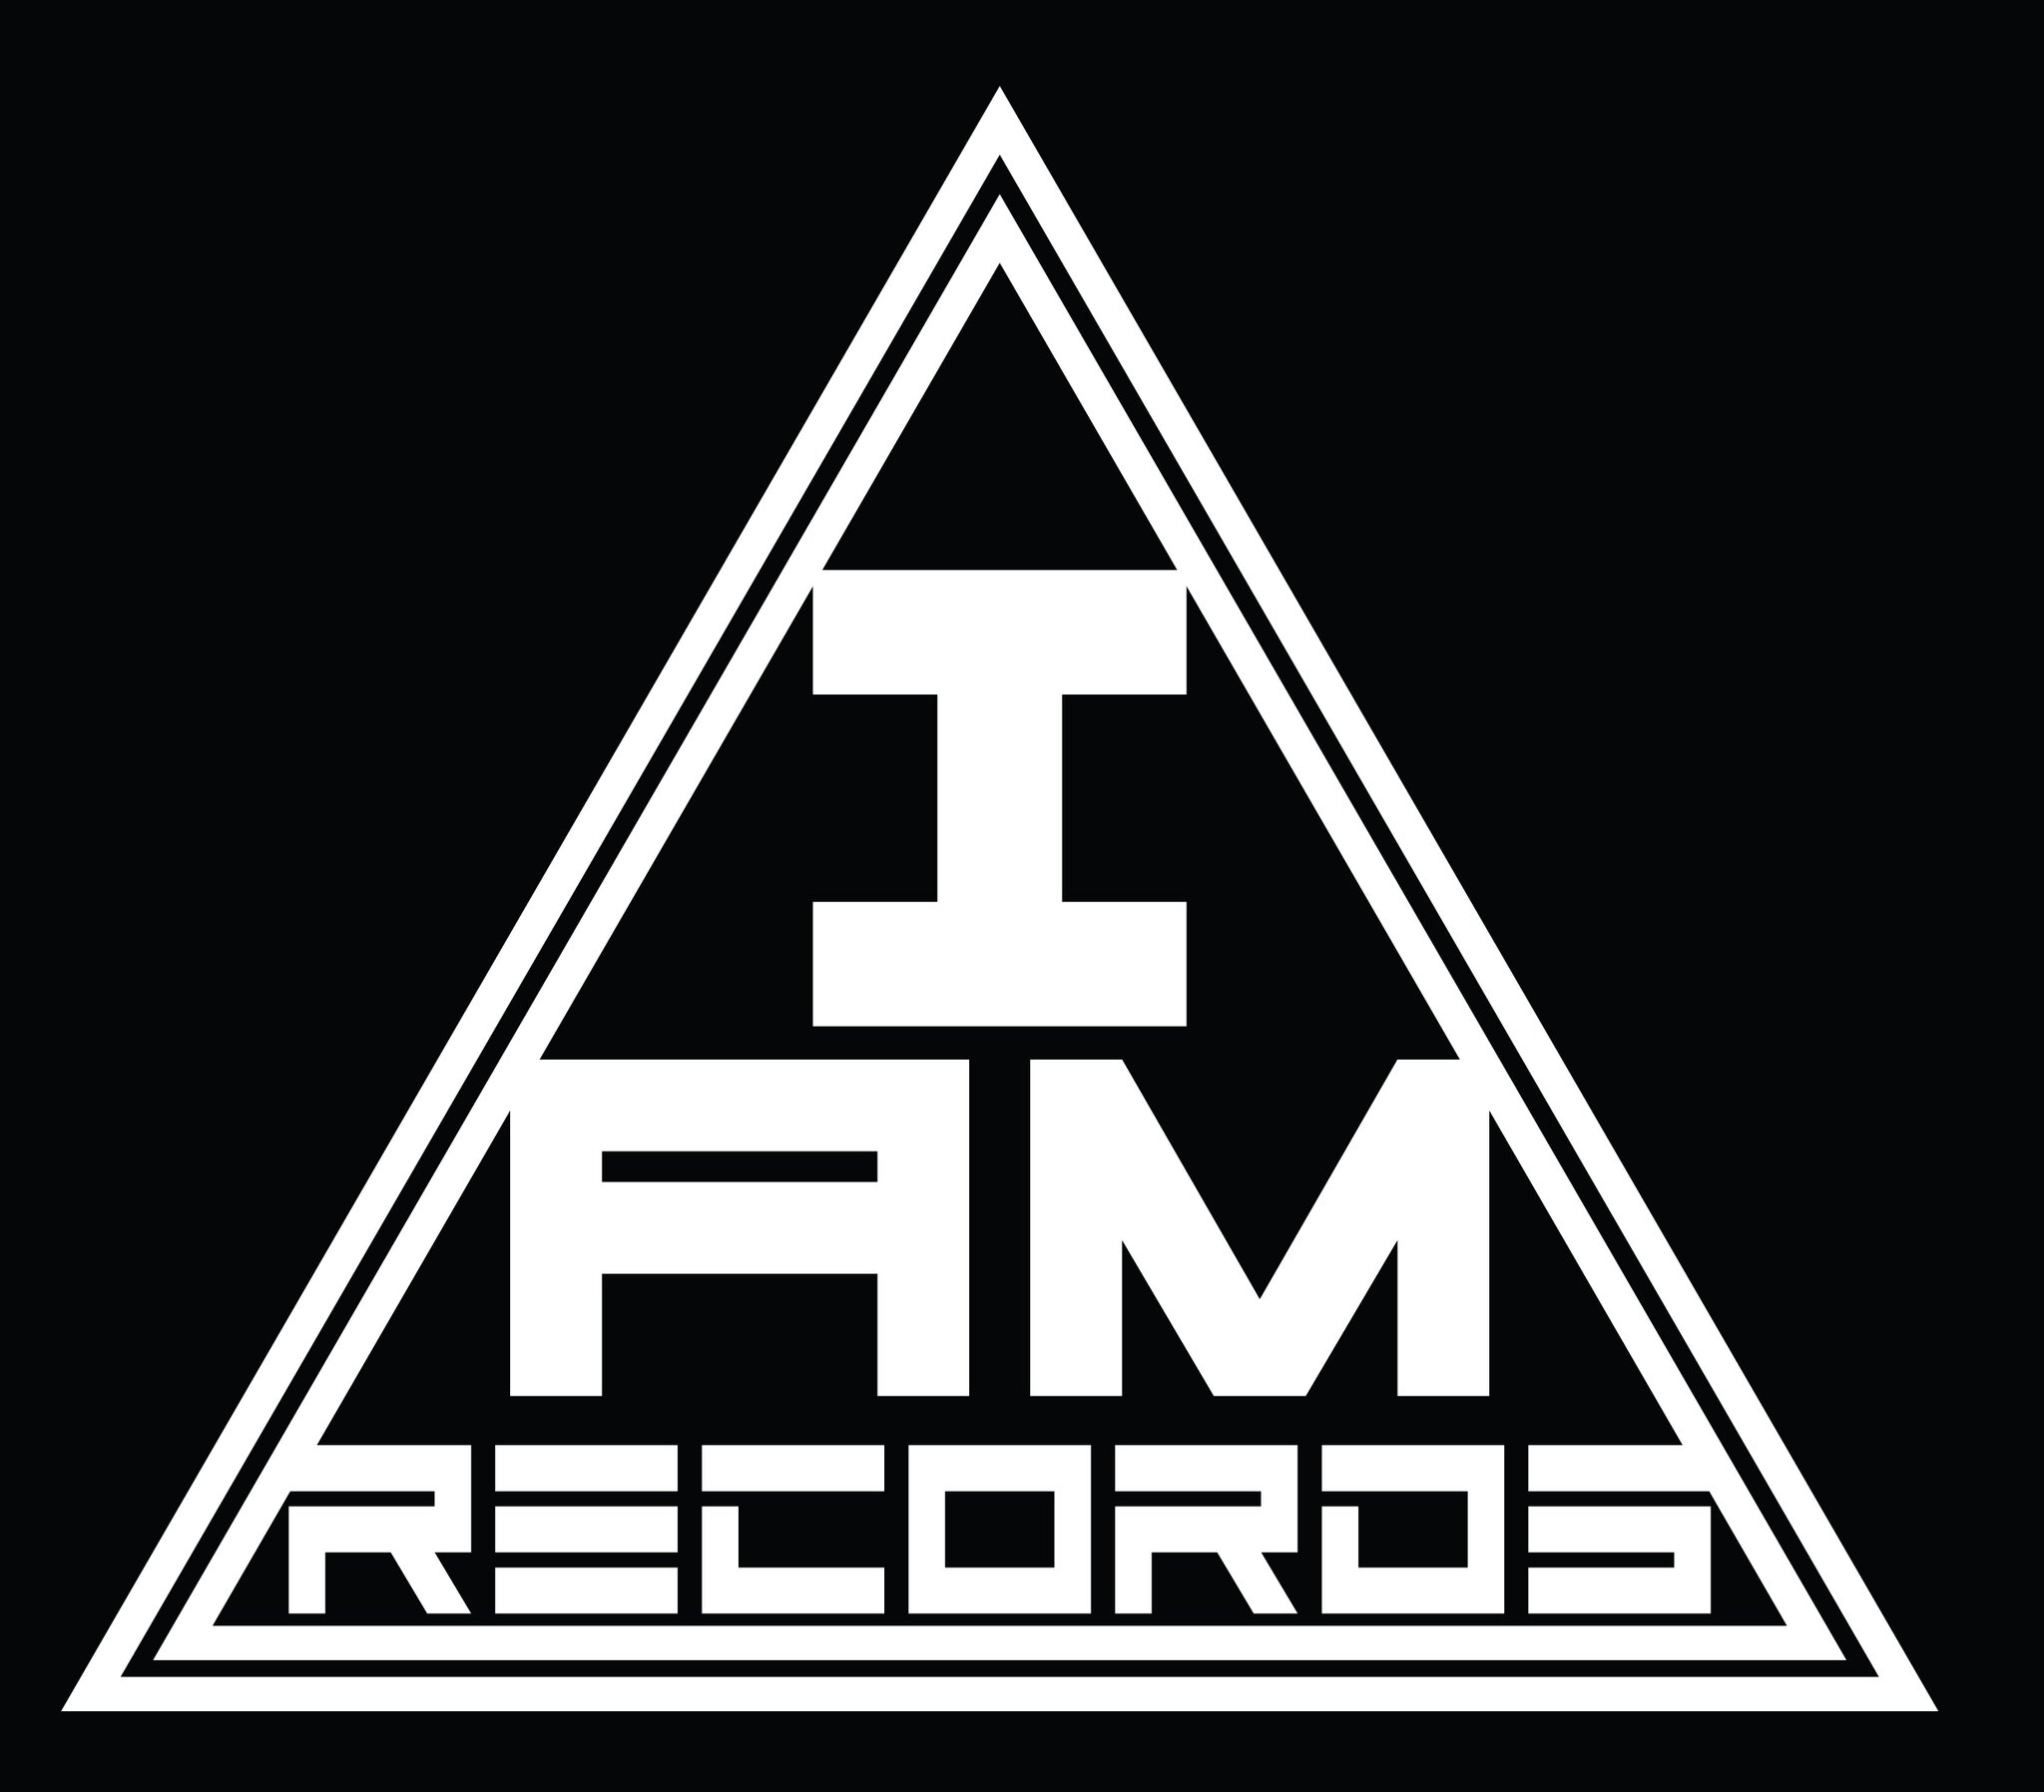 i am records  อยากมีแฟน  i am  yark mee fan  ดารา  คลิปหลุด  นักศิำกษา  sexy  2p